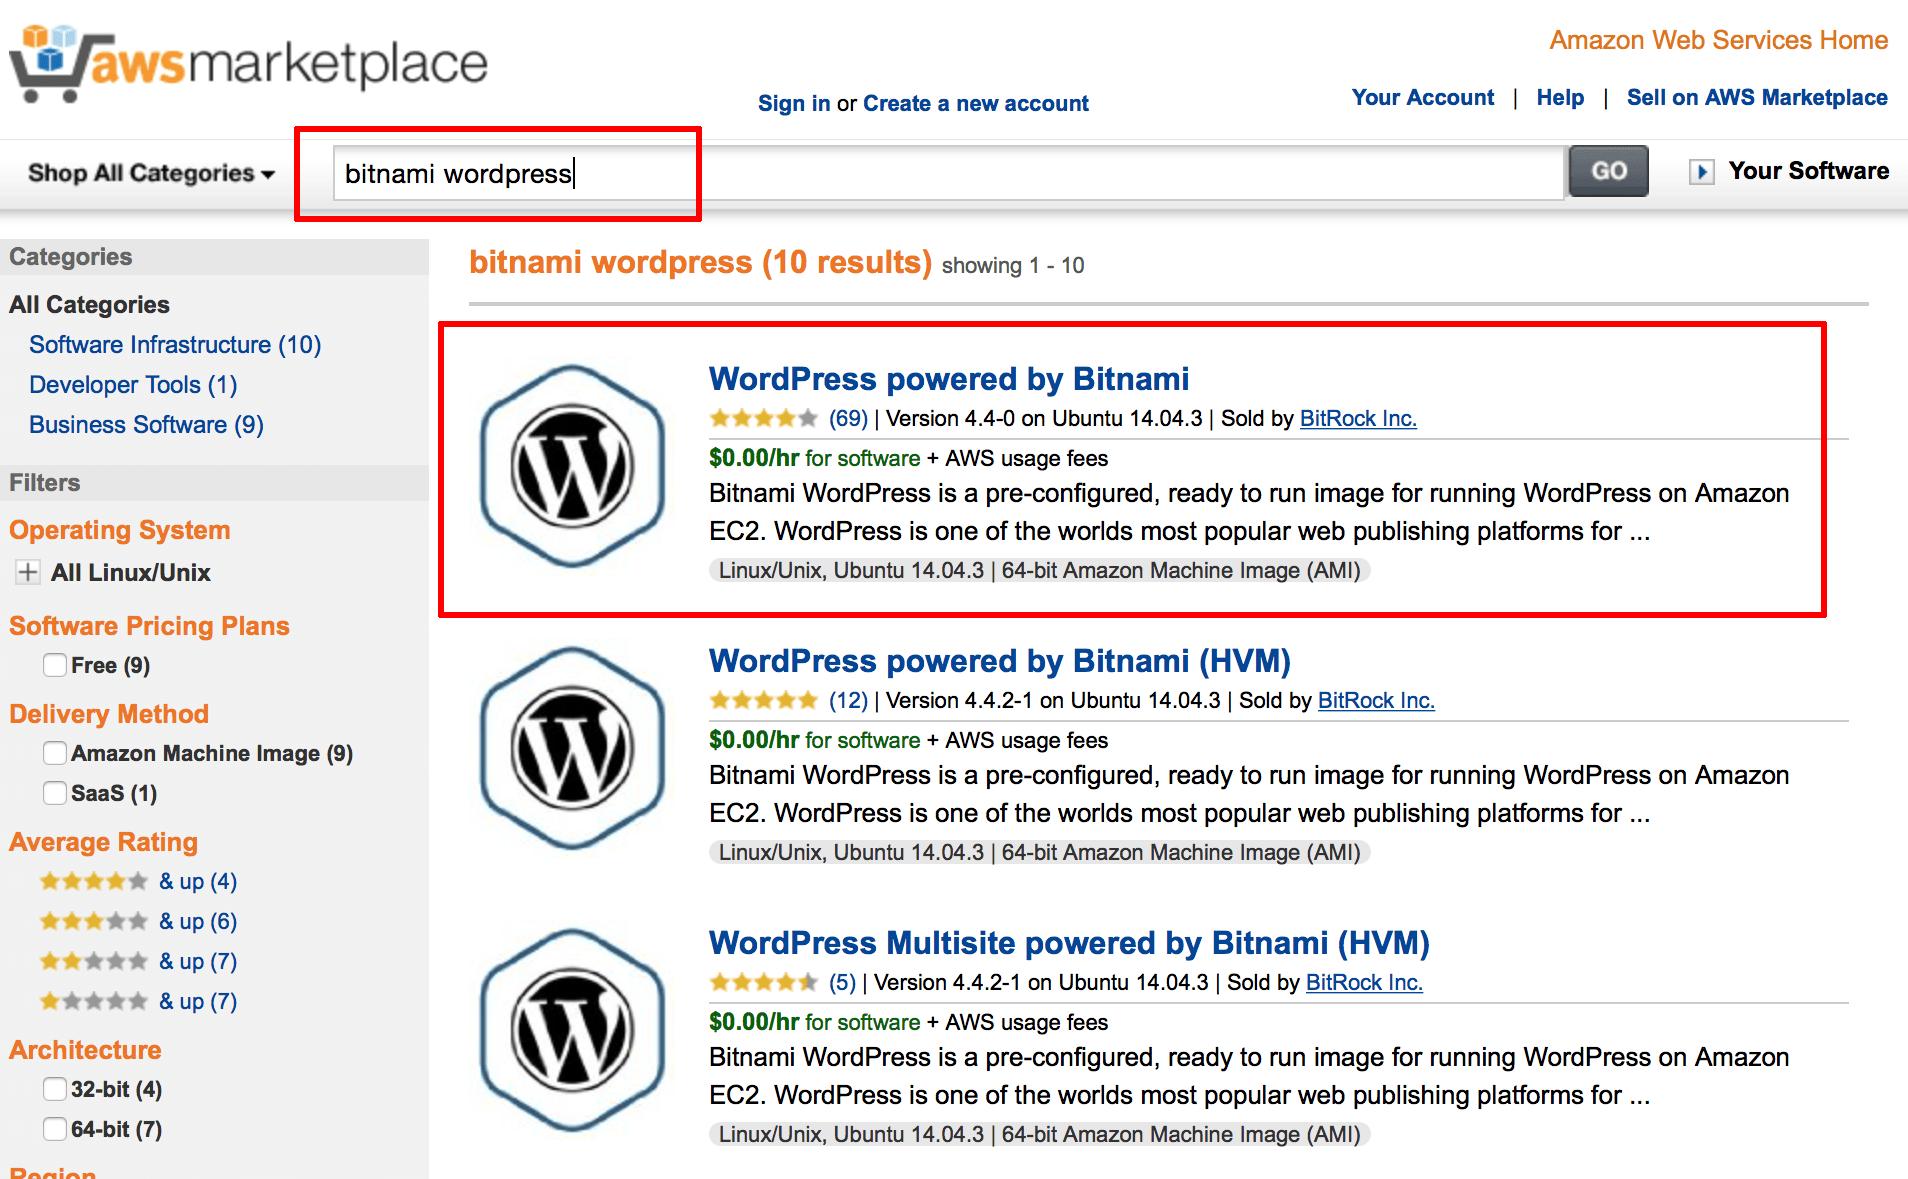 AWS Marketplace launcher